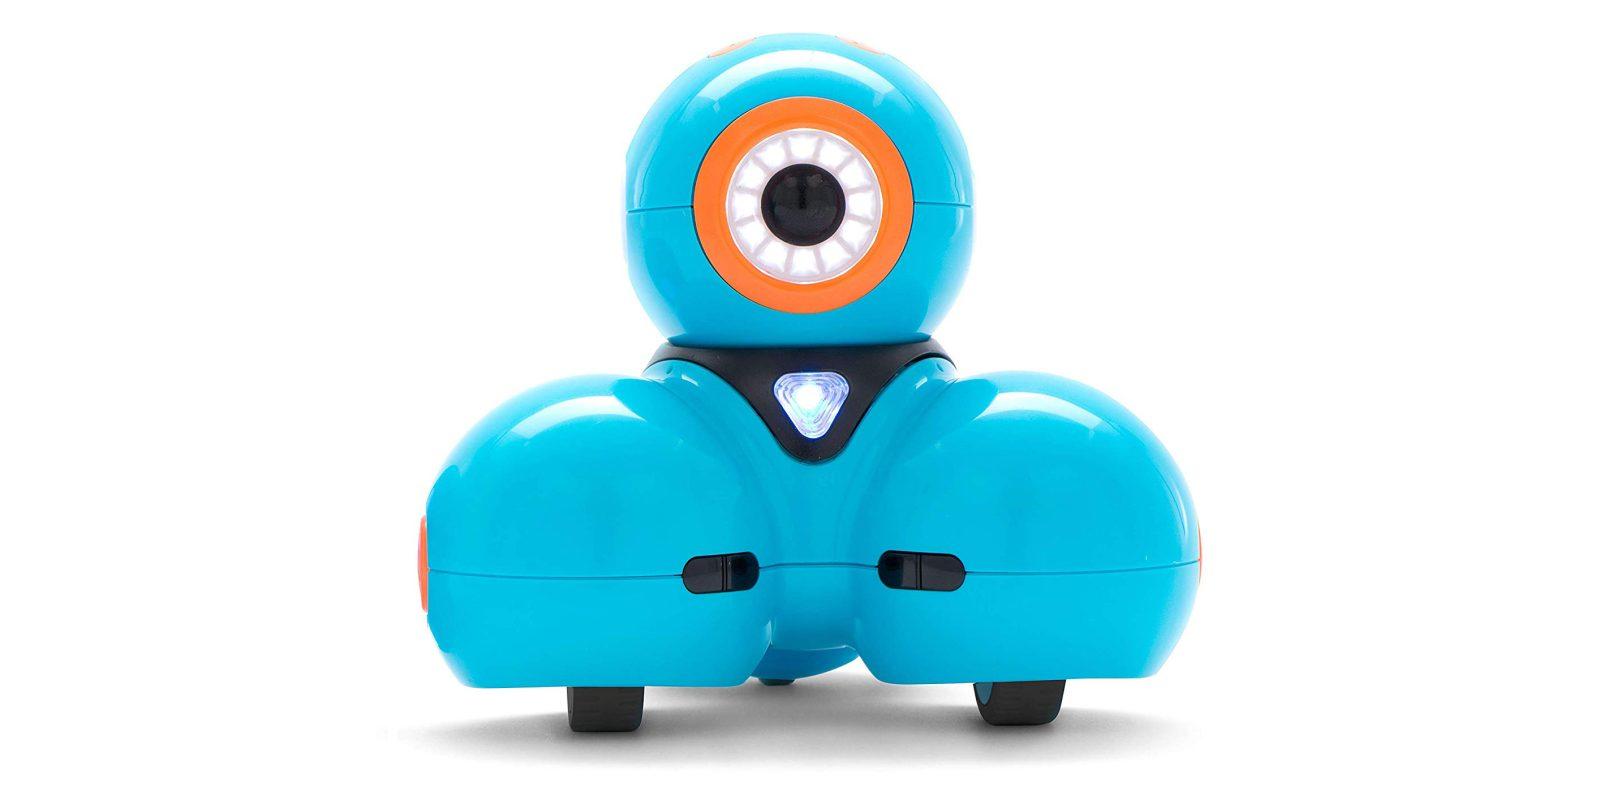 The STEM-focused Wonder Workshop Dash toy is $83 at Amazon